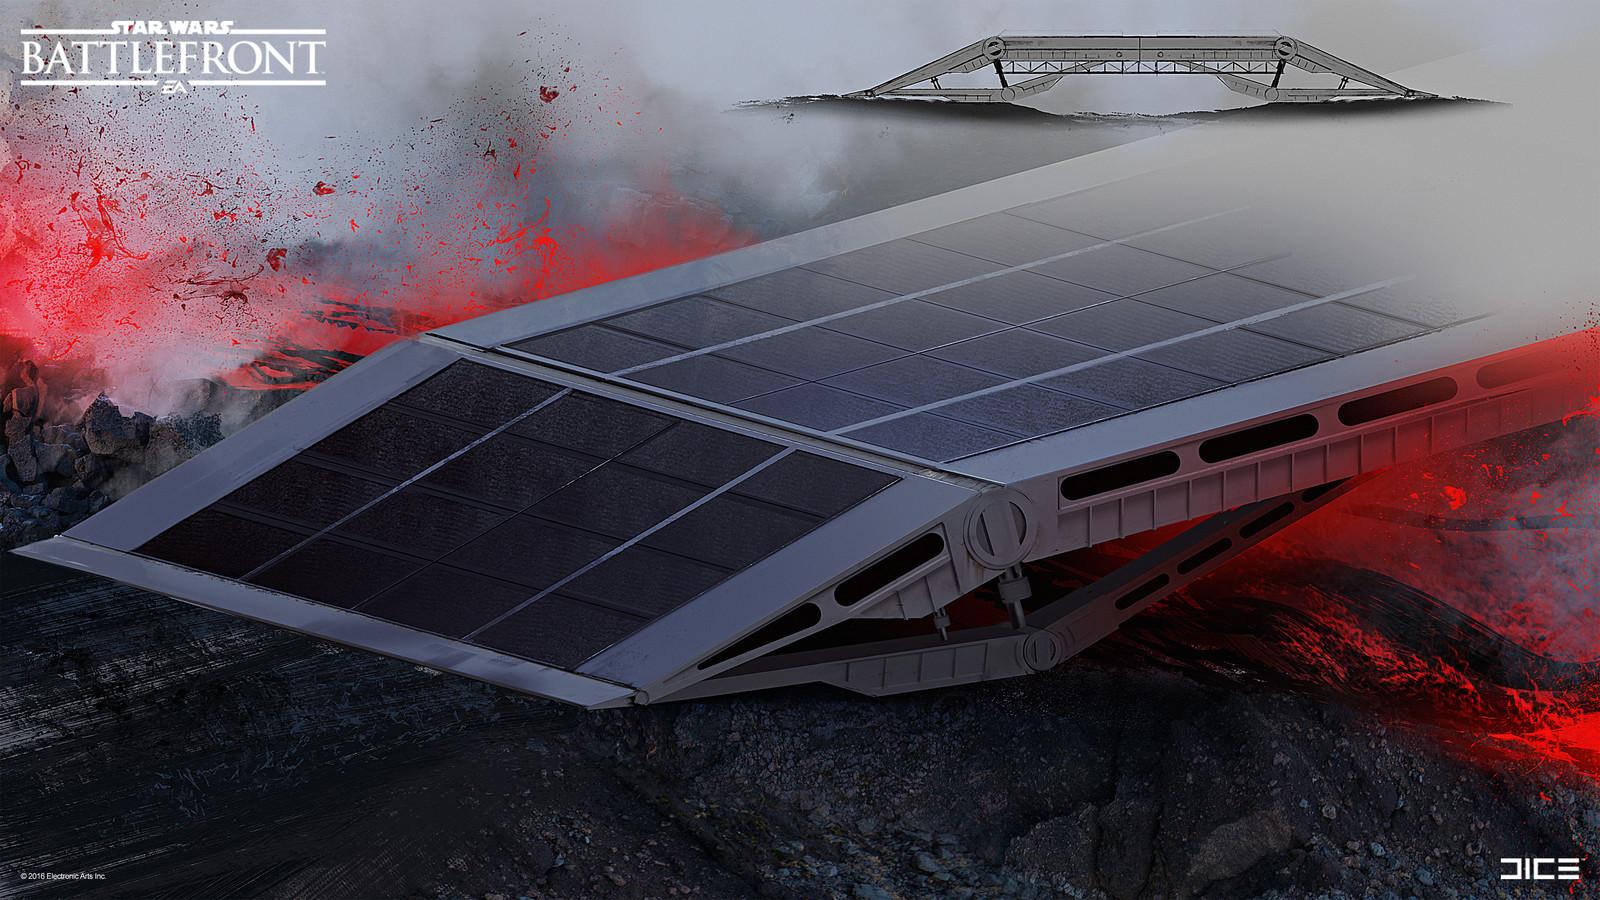 Imperial mobile bridge on Sullust Concept Art for the 2015 Star Wars Battlefront game. (2014)